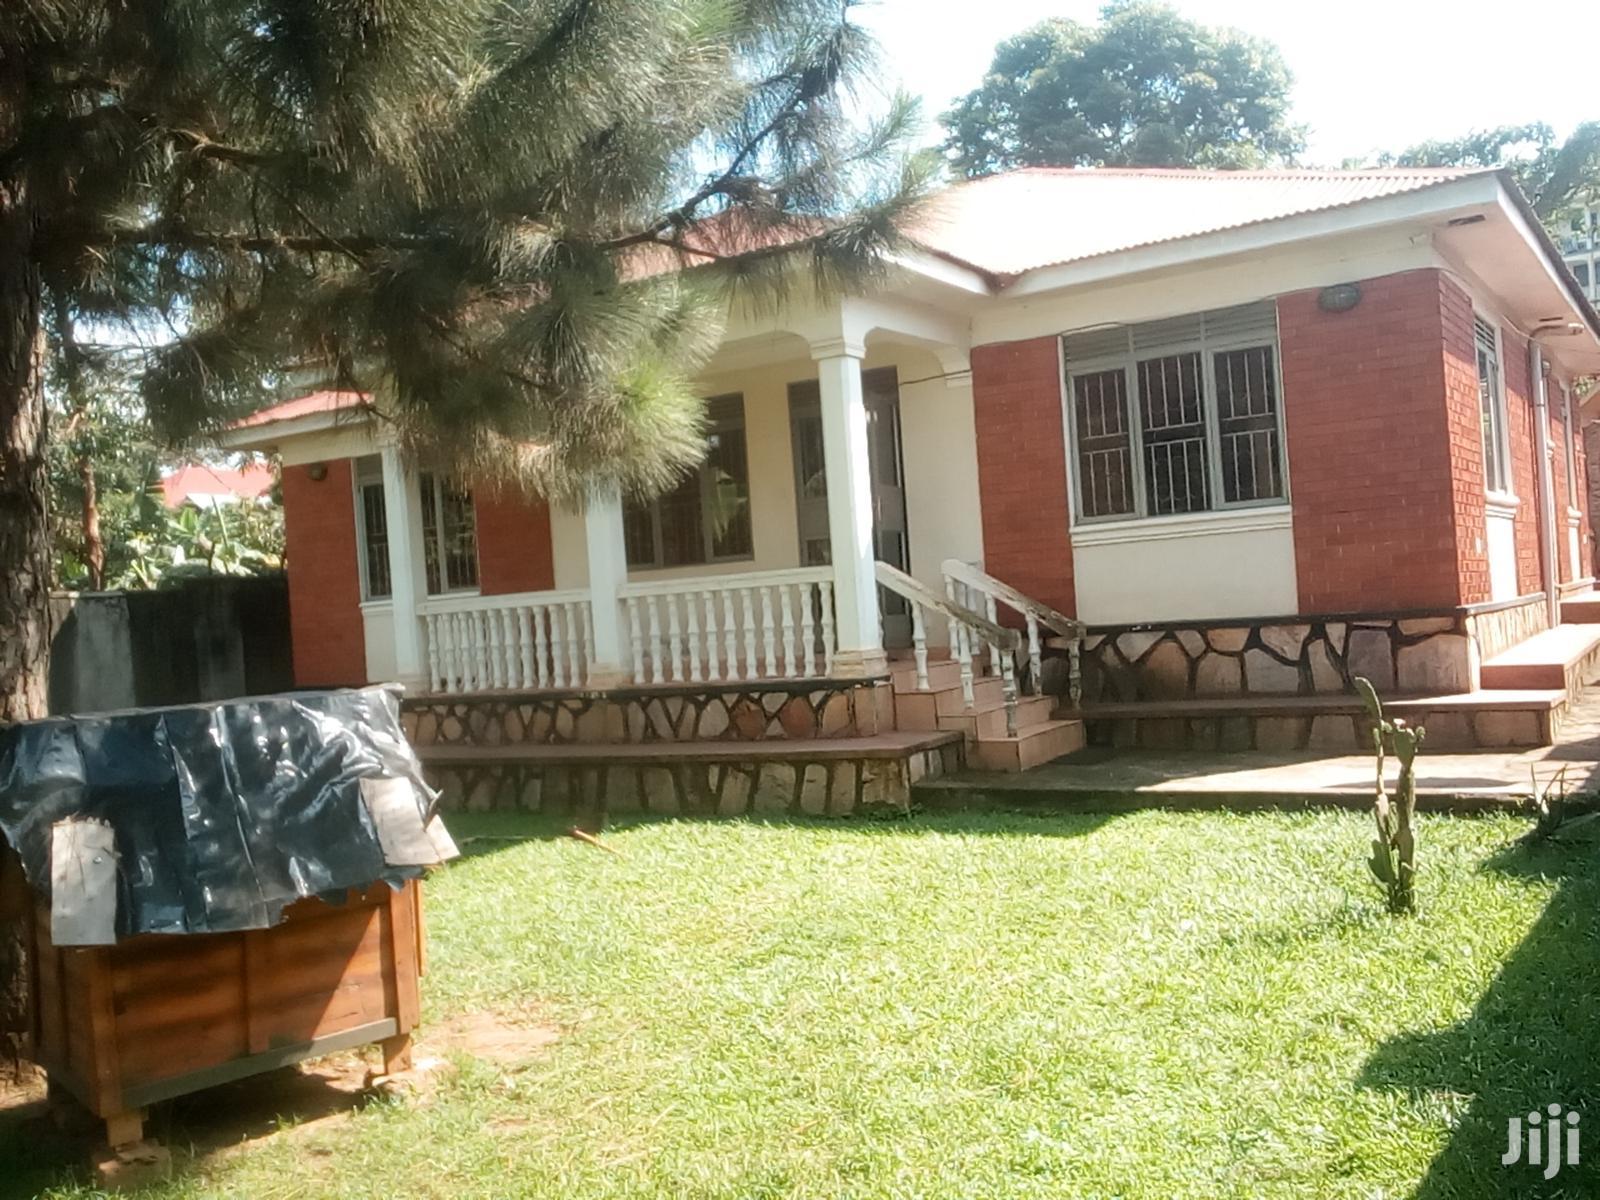 Three Bedroom House In Kirinya Kito Road For Rent